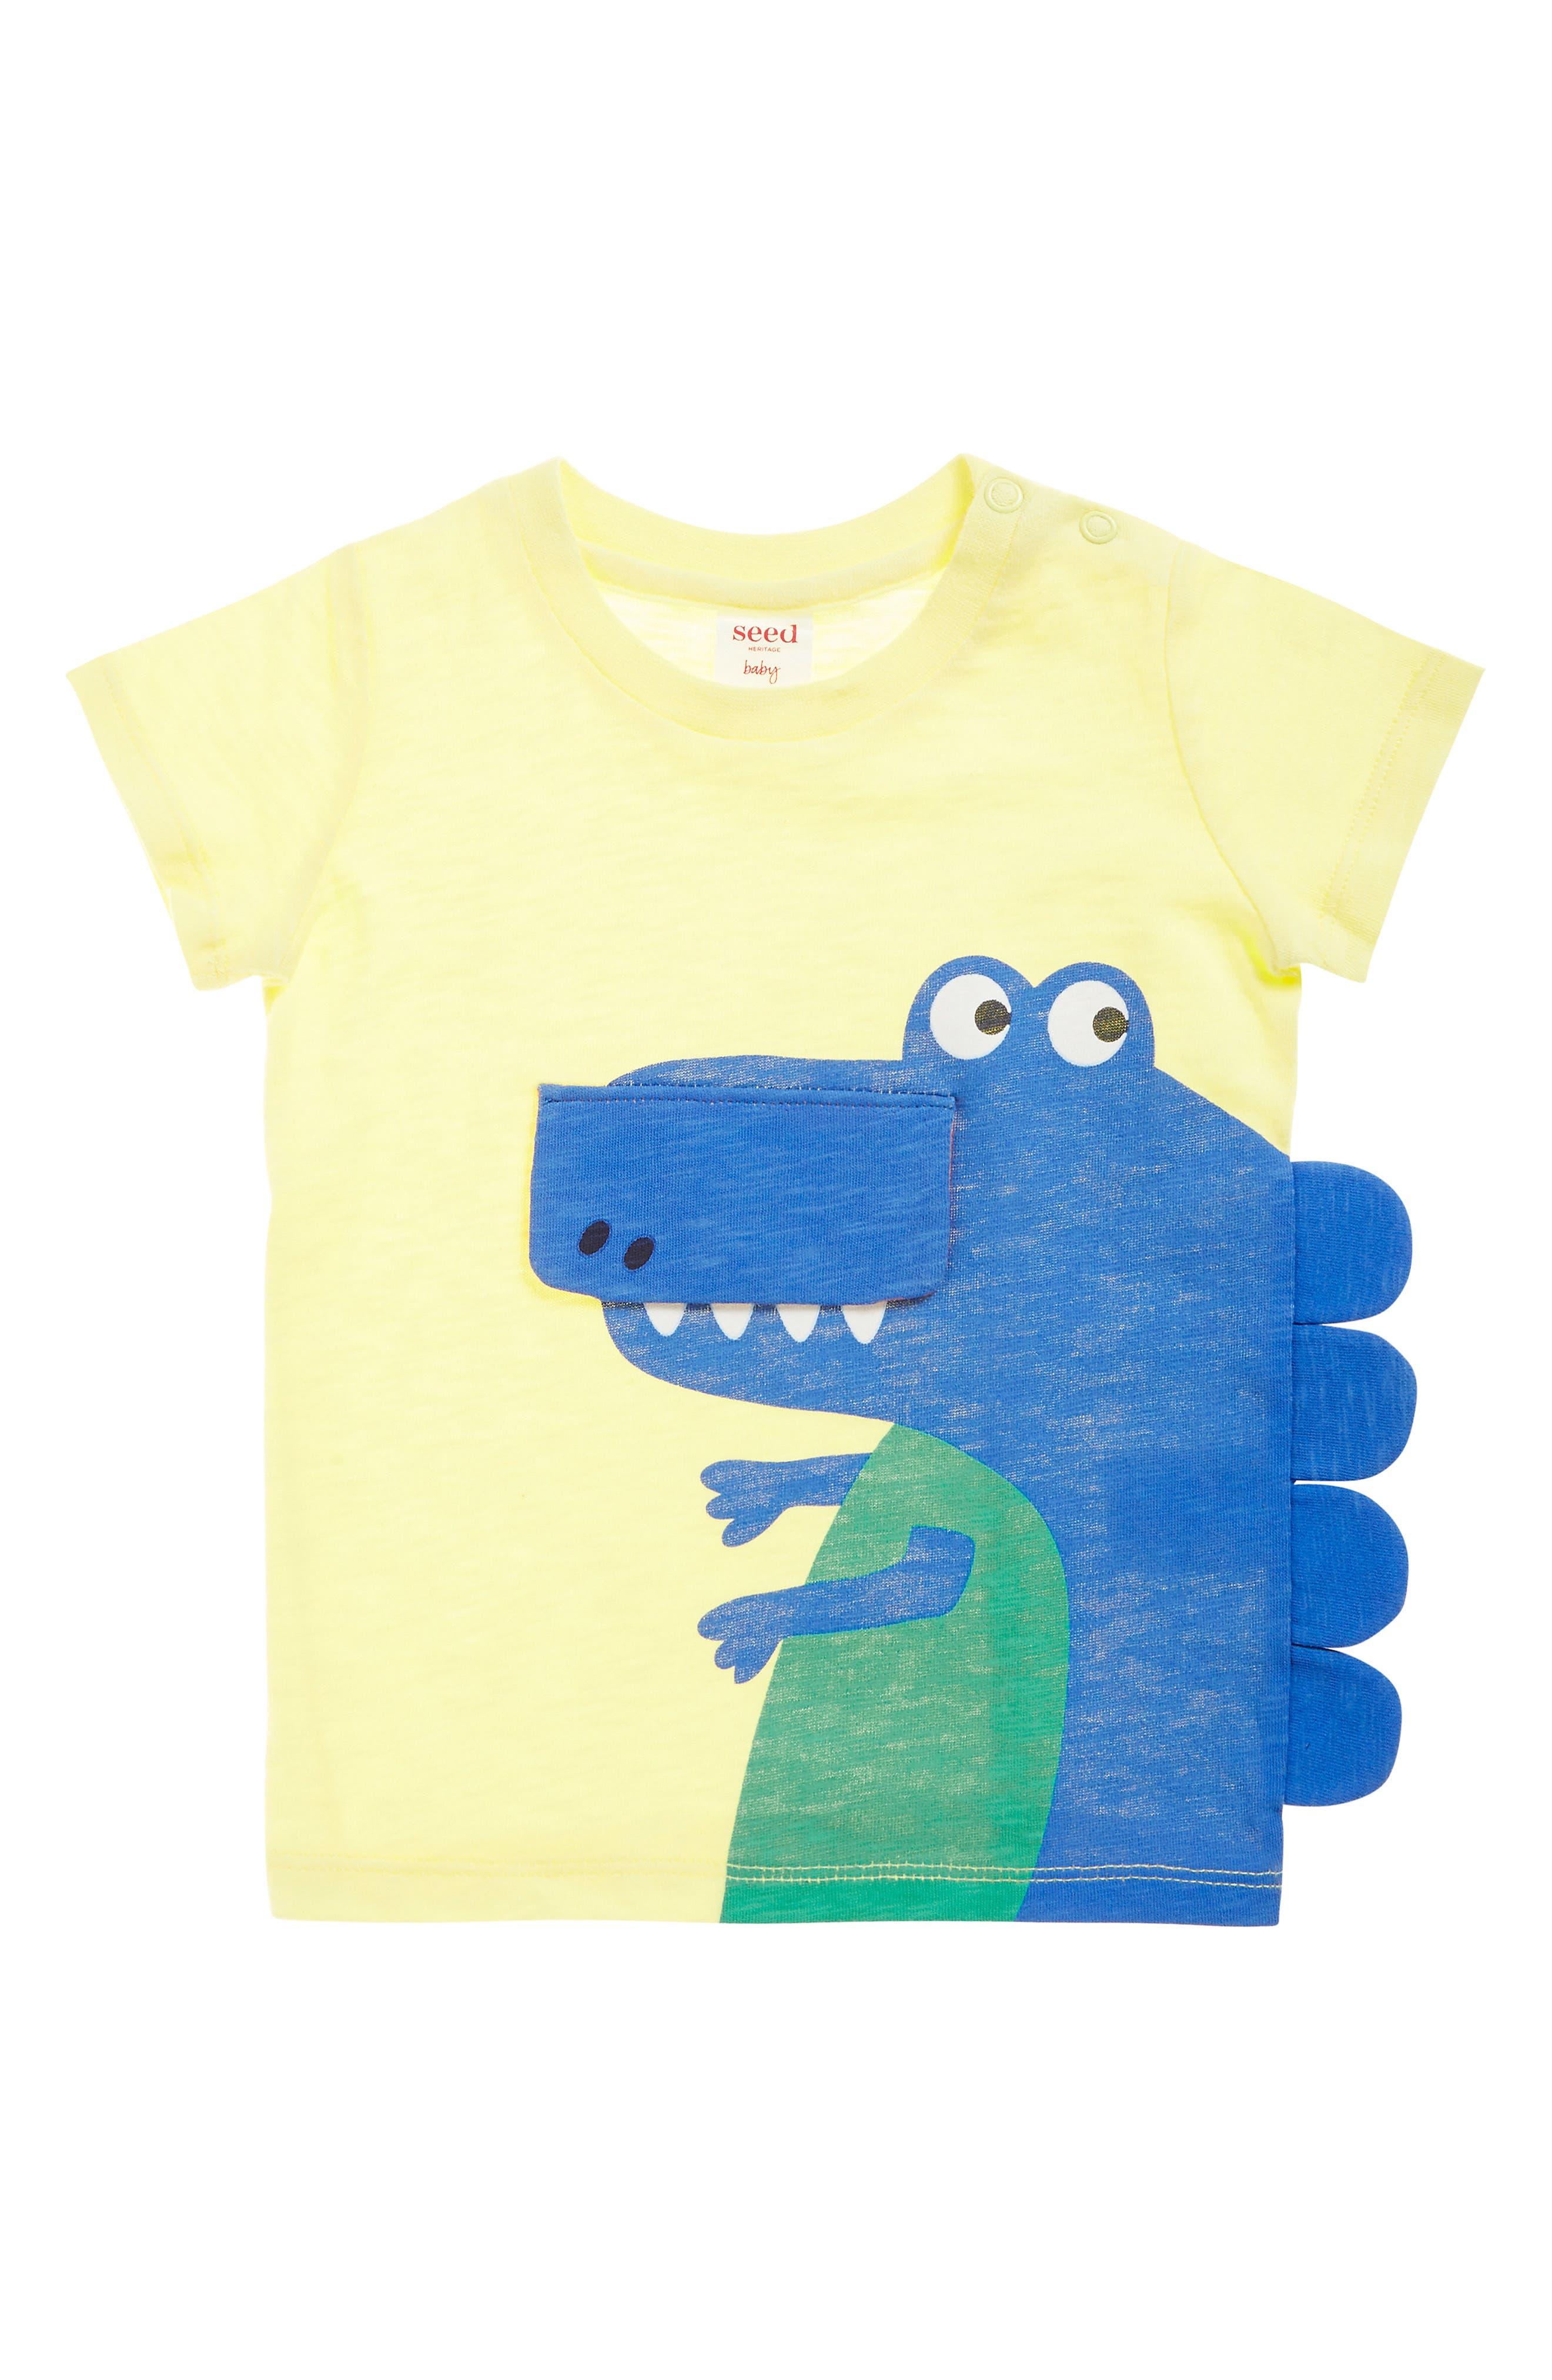 SEED HERITAGE, Dino Flip T-Shirt, Main thumbnail 1, color, 700